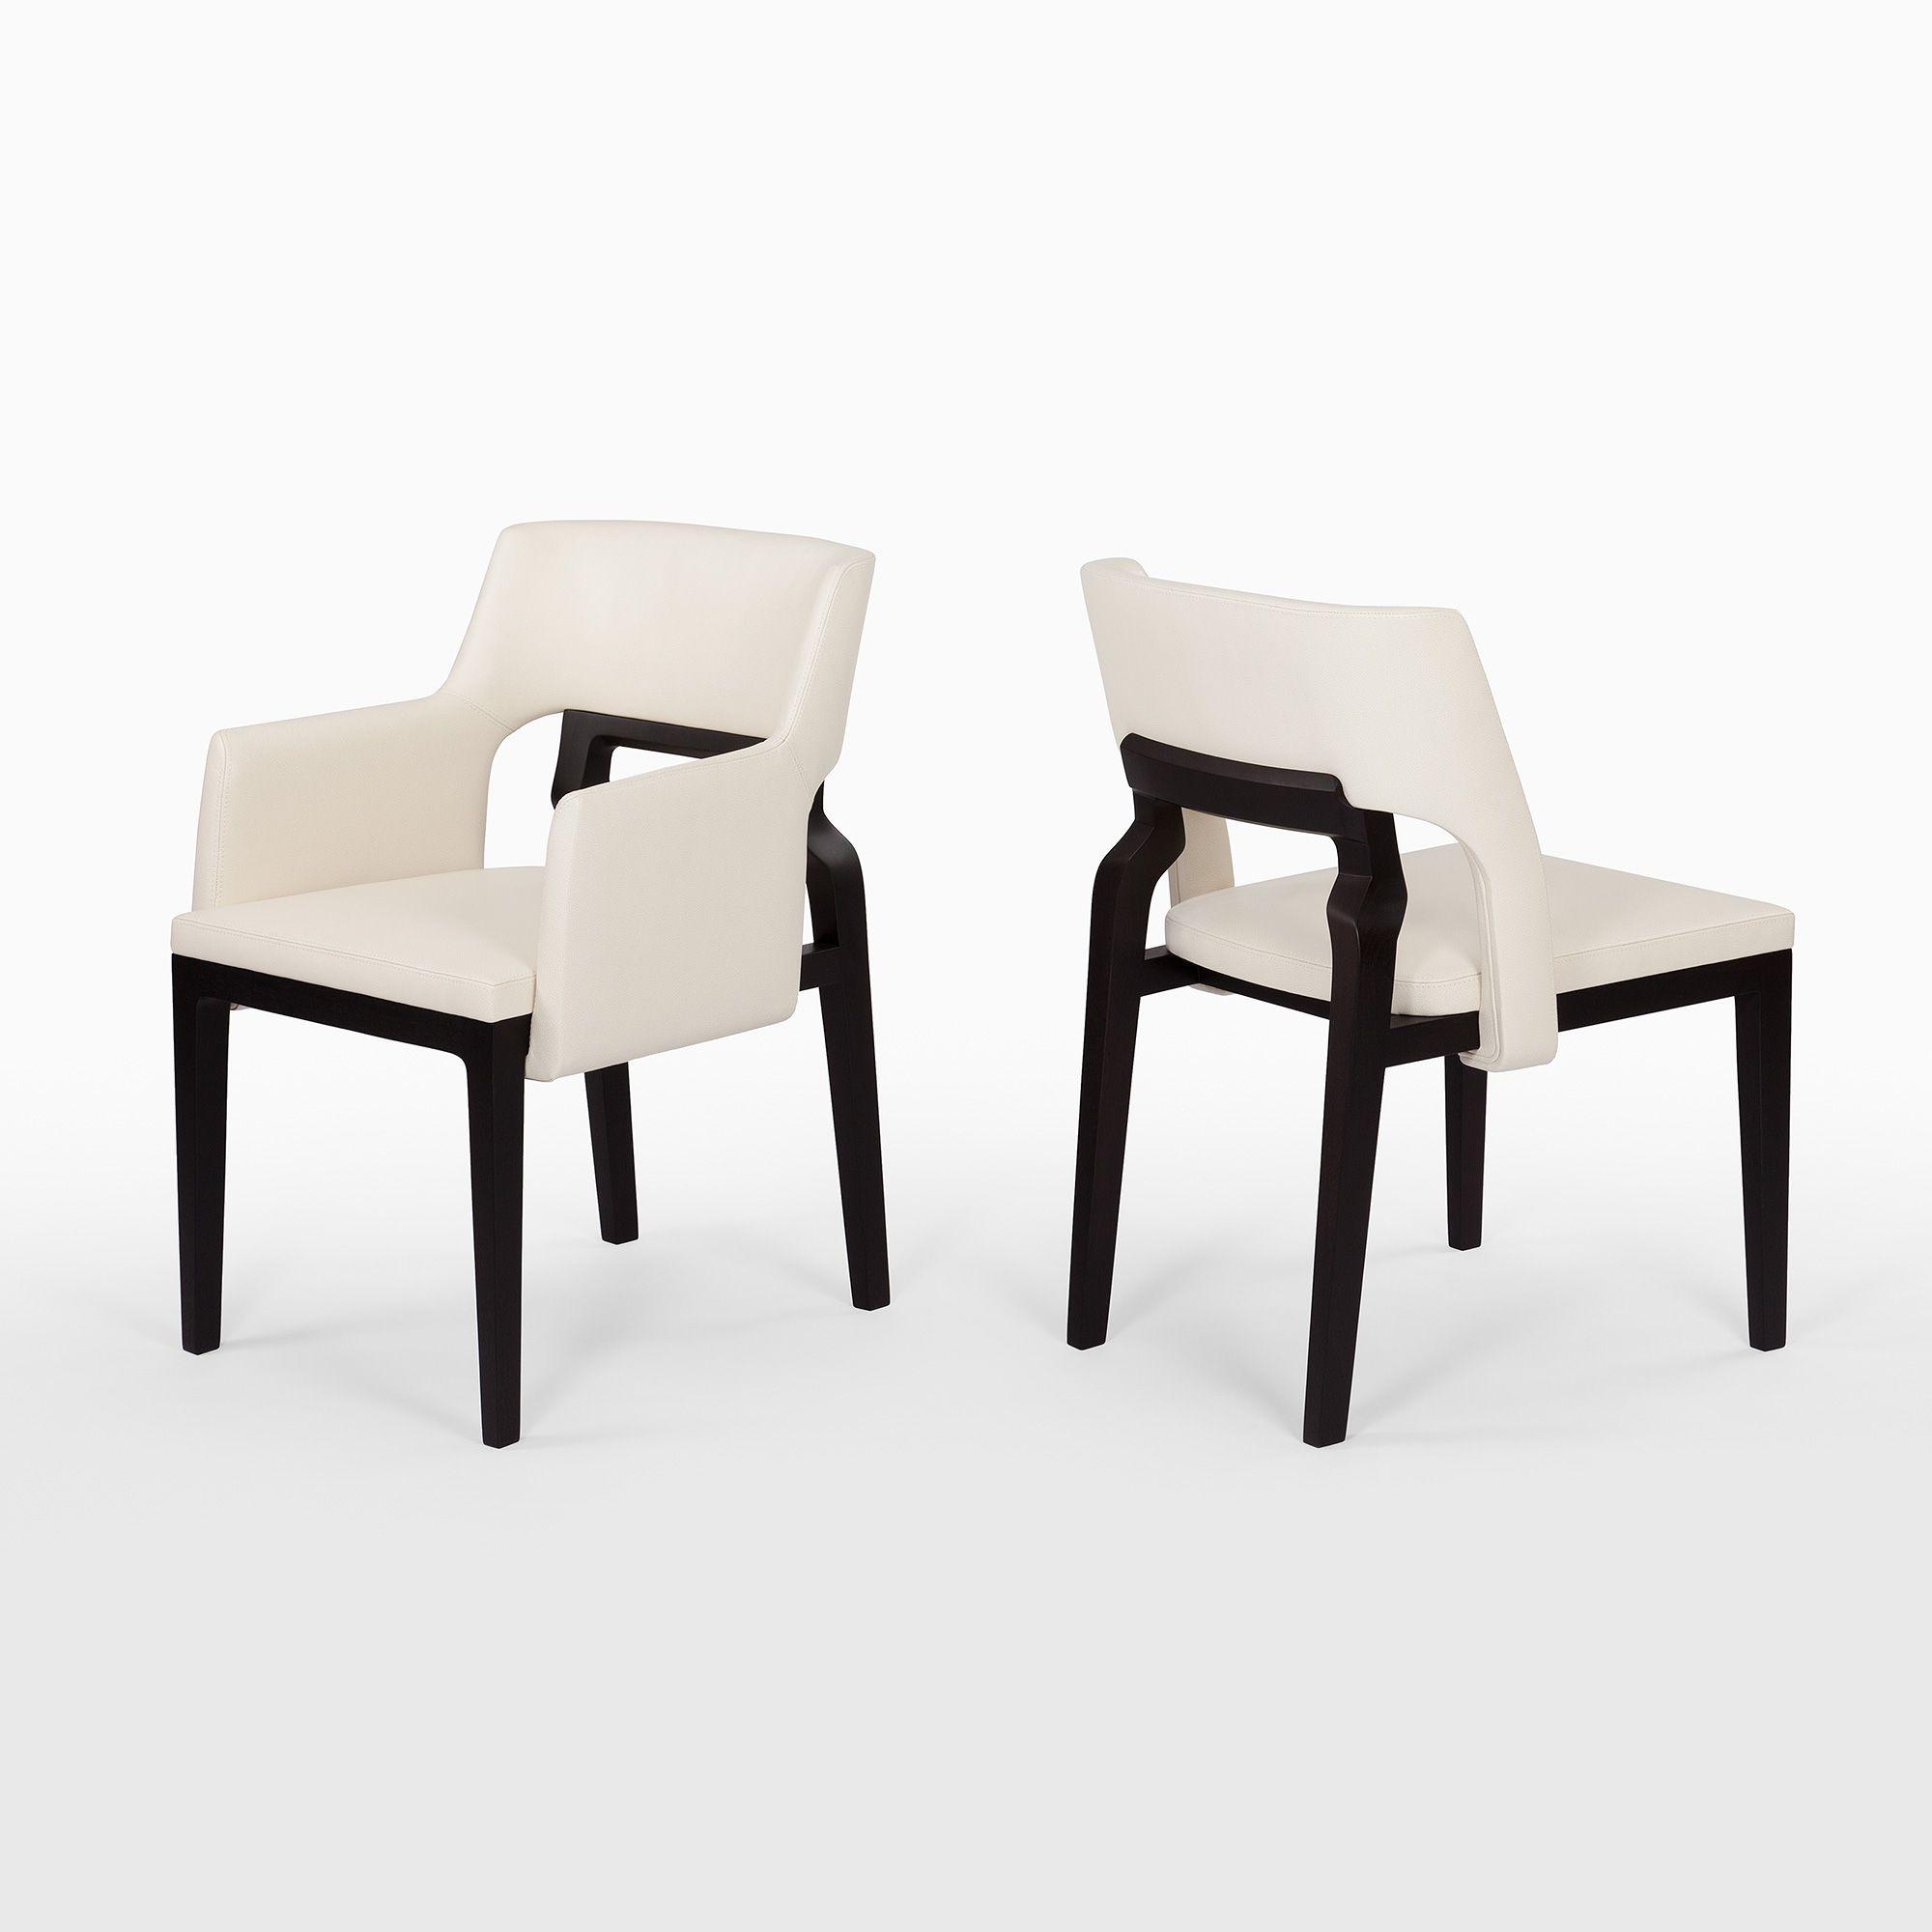 Gallatin Dining Arm Chair Caste Design Side Chairs Dining Contemporary Dining Room Chair Dining Room Chairs Modern #side #chairs #with #arms #for #living #room